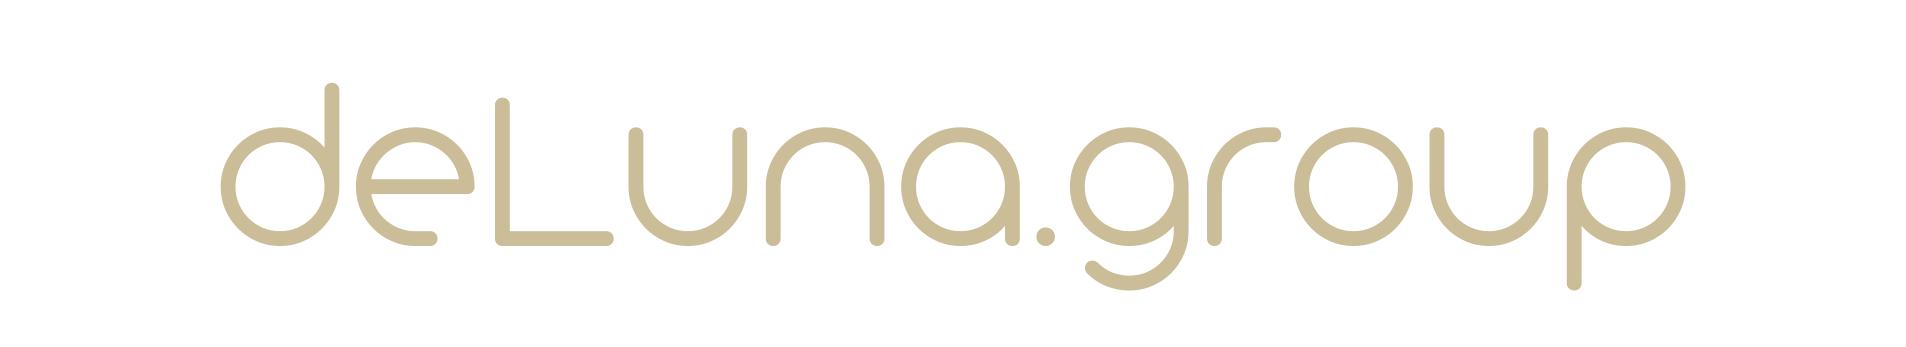 deLunagroup corporate